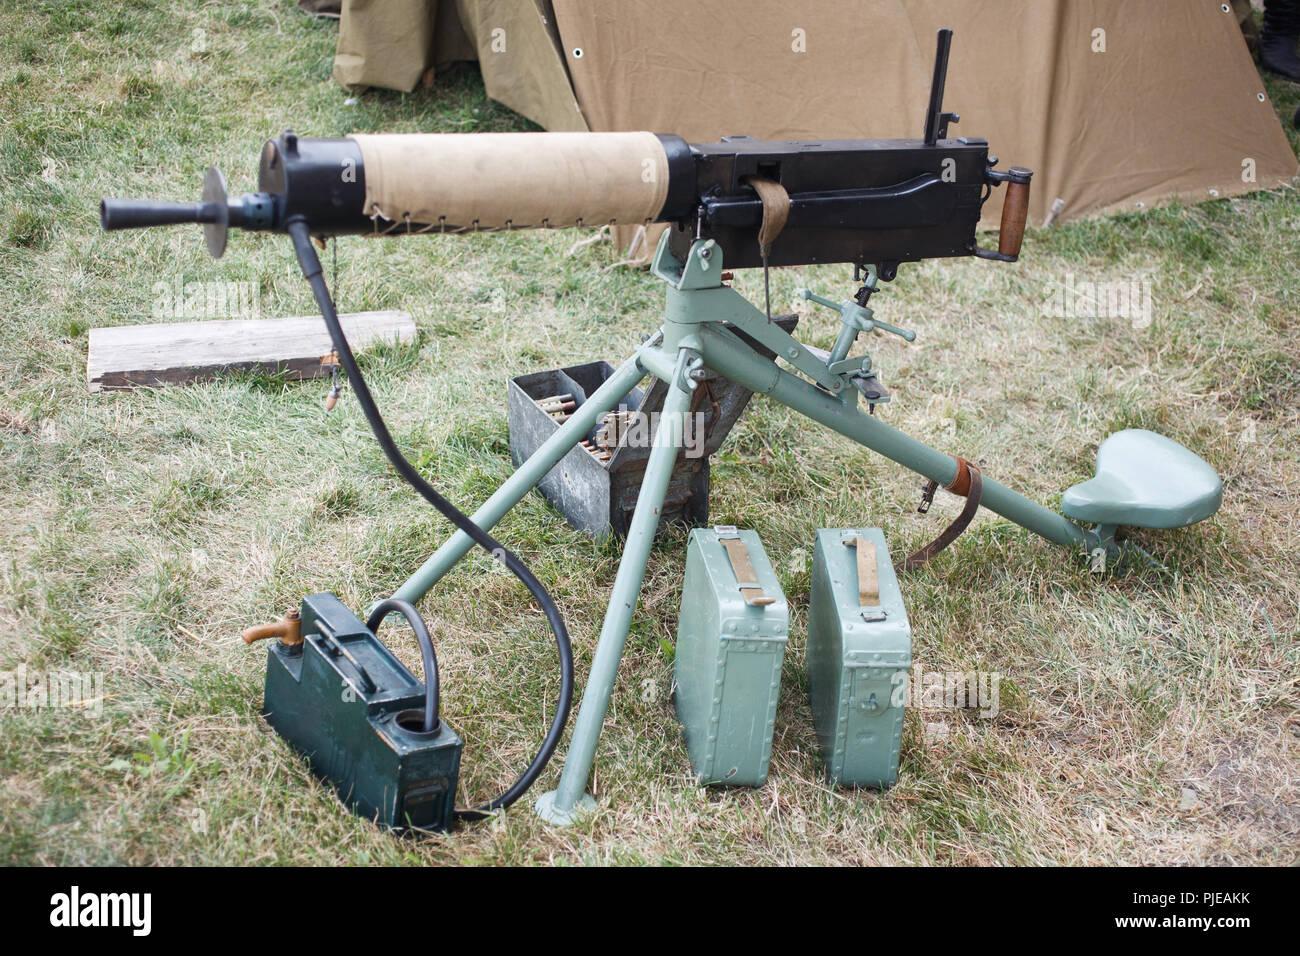 WWI german machine gun MG 08 with amunition belt - Stock Image